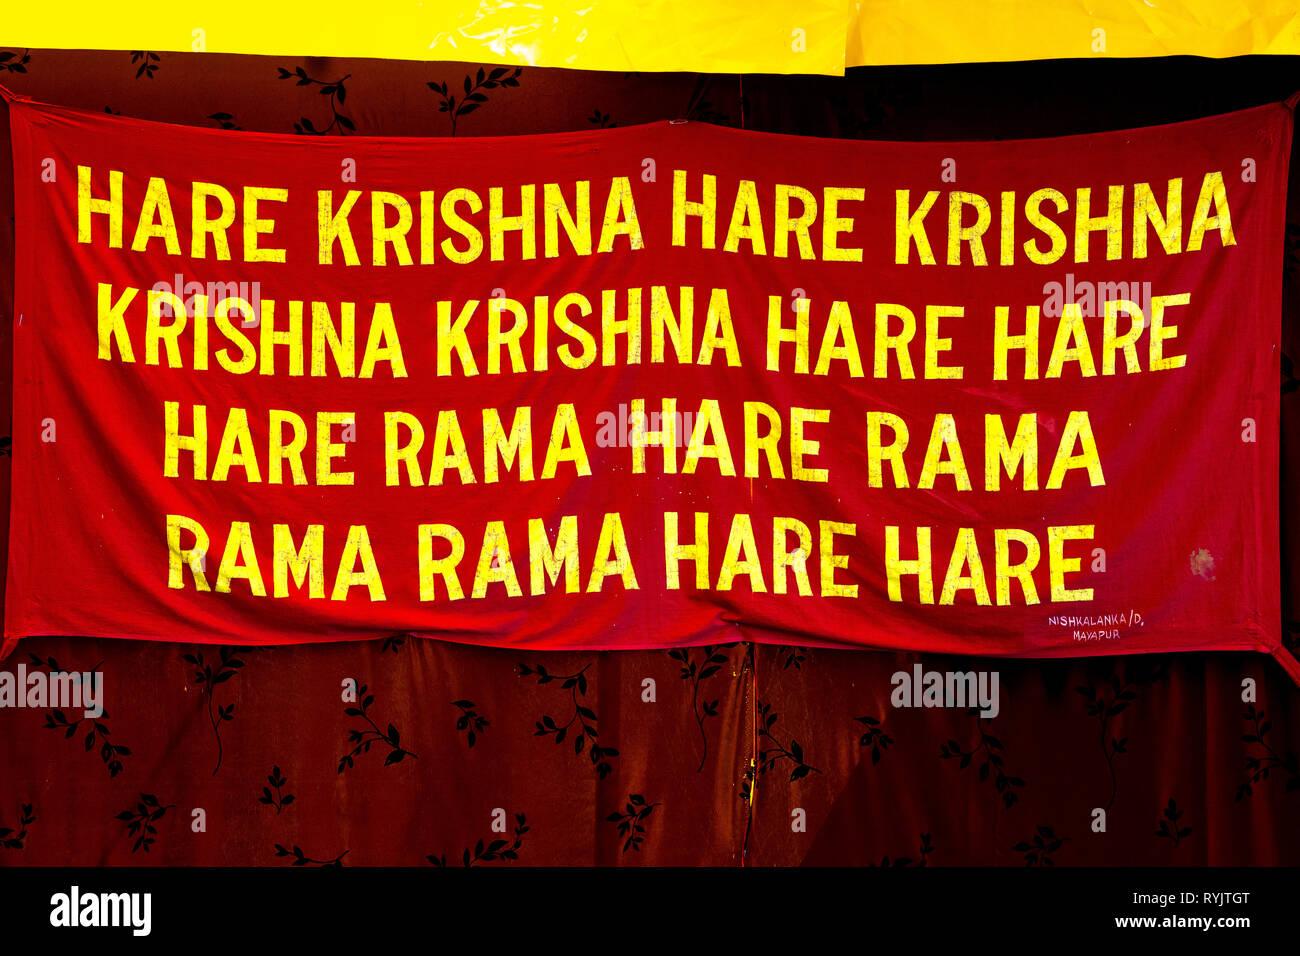 En banner Hare Krishna Janmashtami Bhaktivedanta manor durante el festival hindú, Watford, Reino Unido. Imagen De Stock